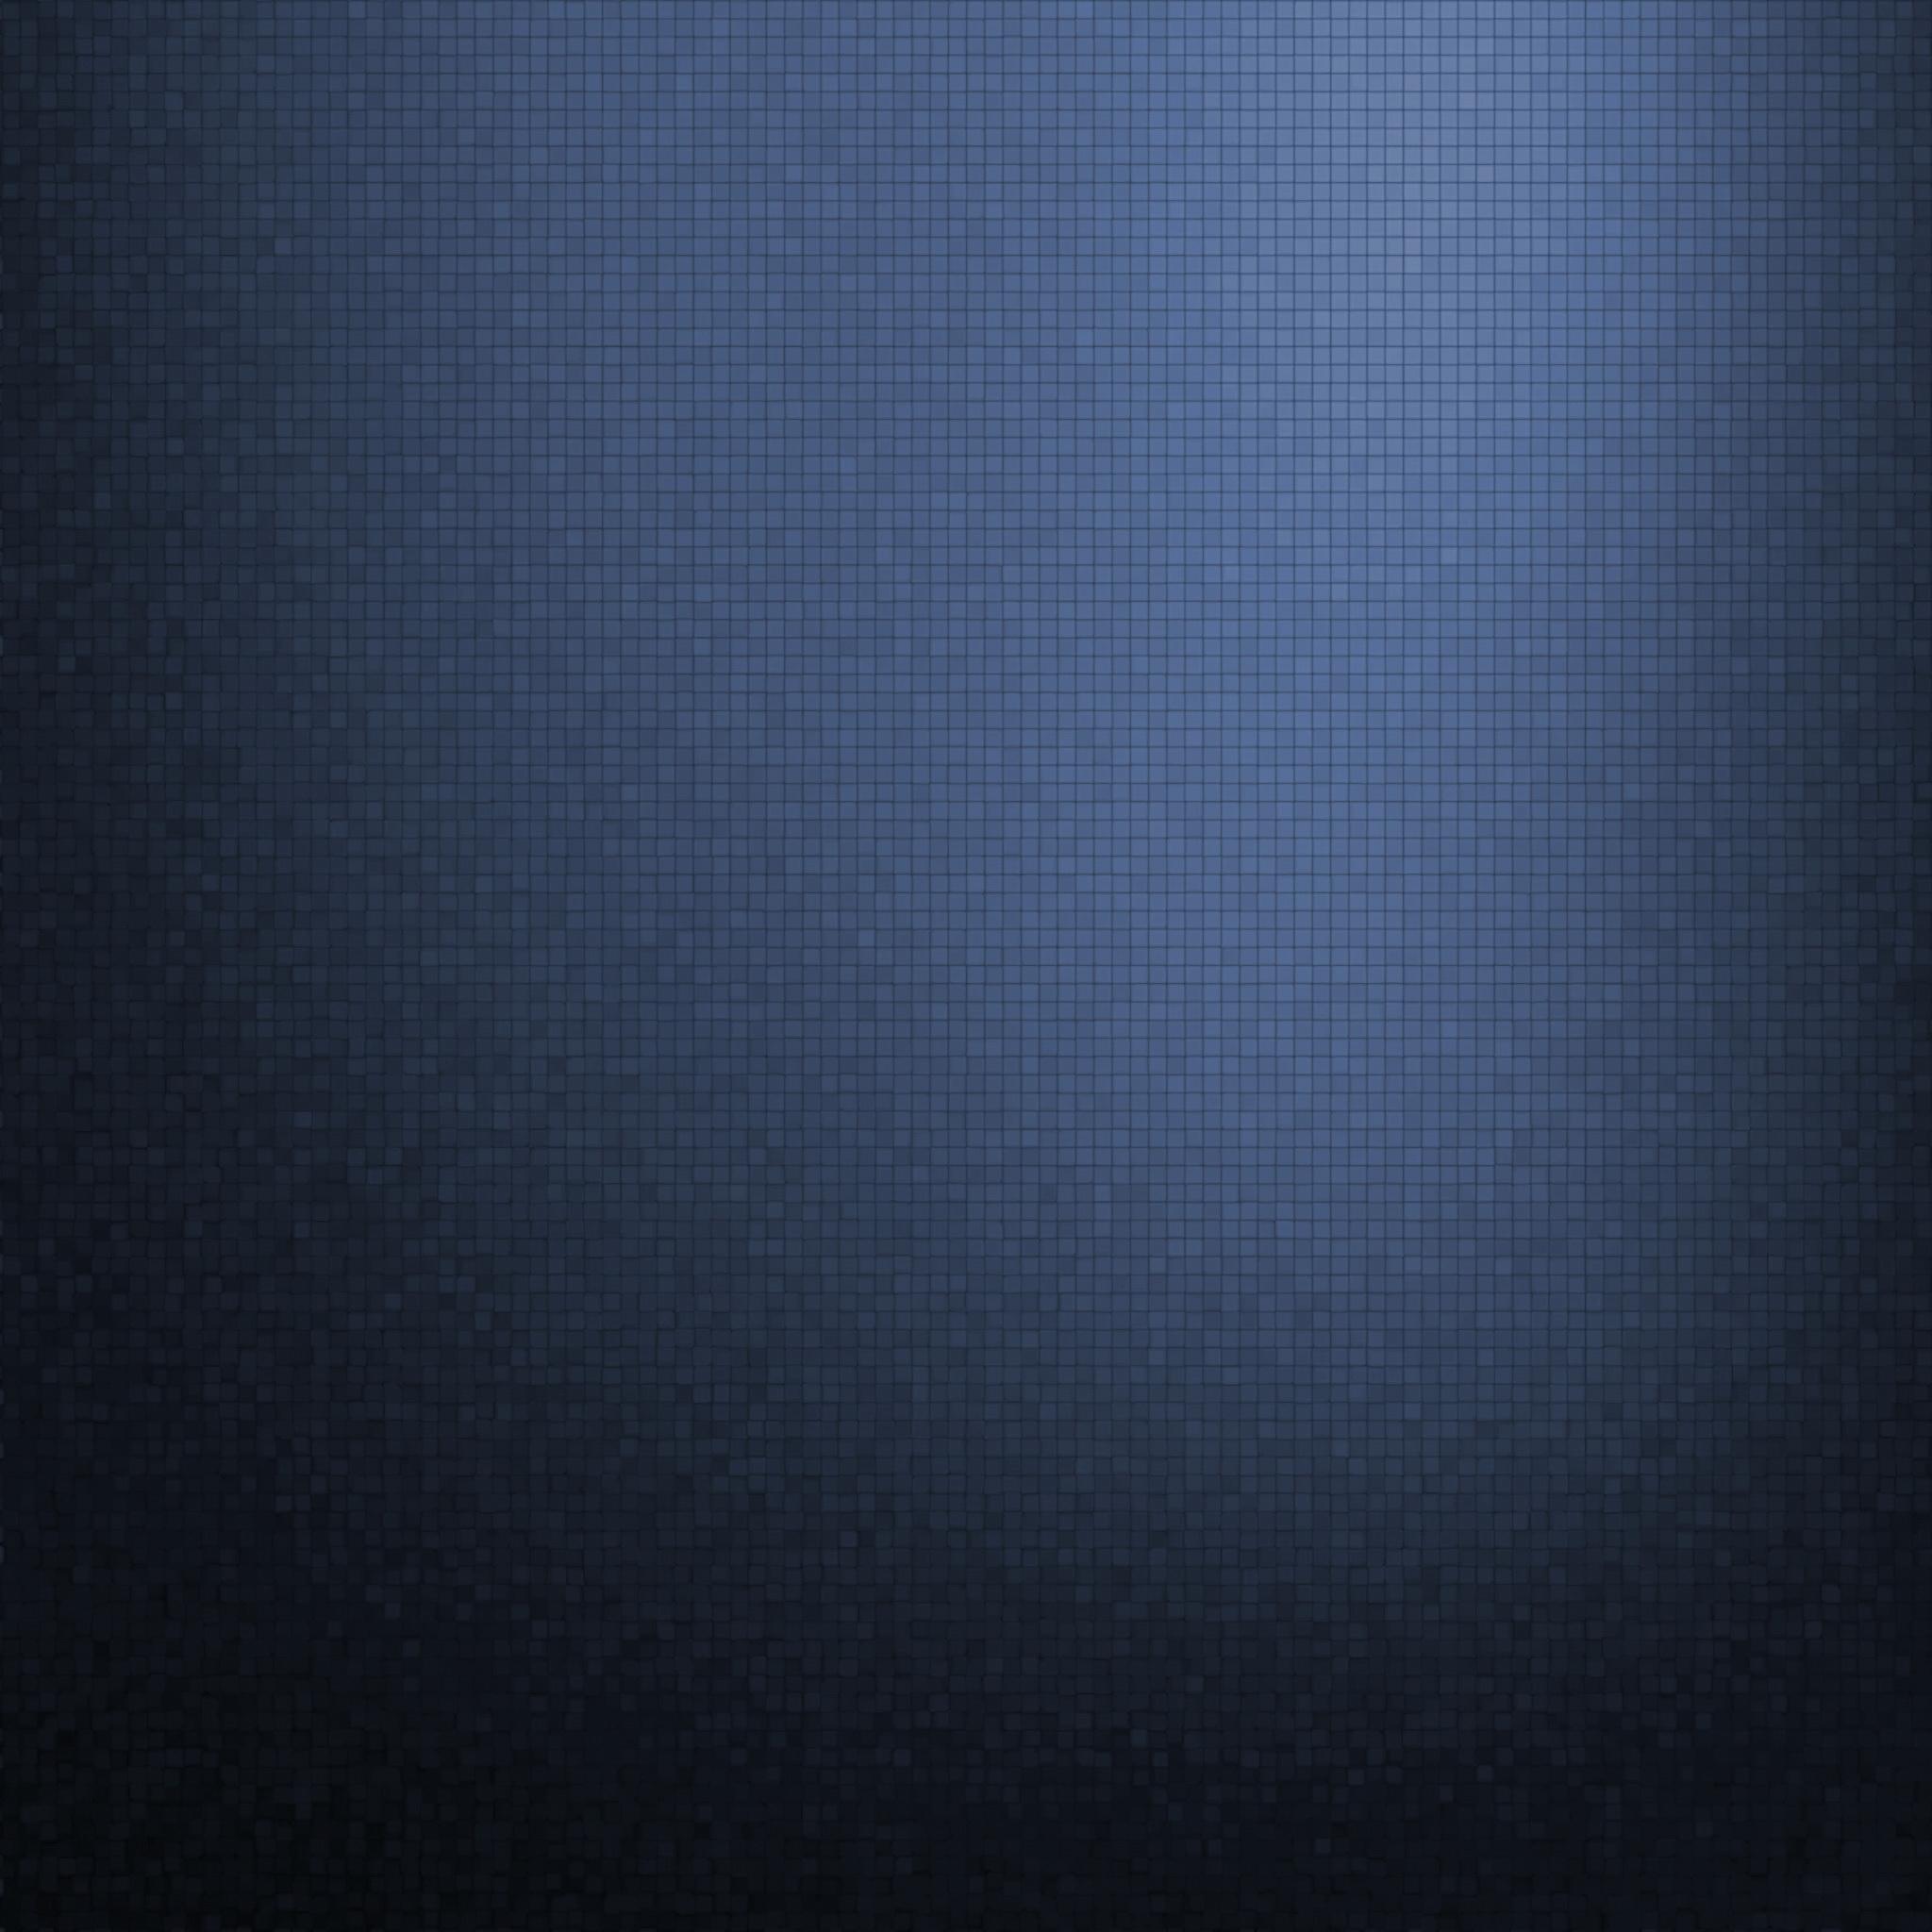 iPad Mini Wallpapers Retina - WallpaperSafari